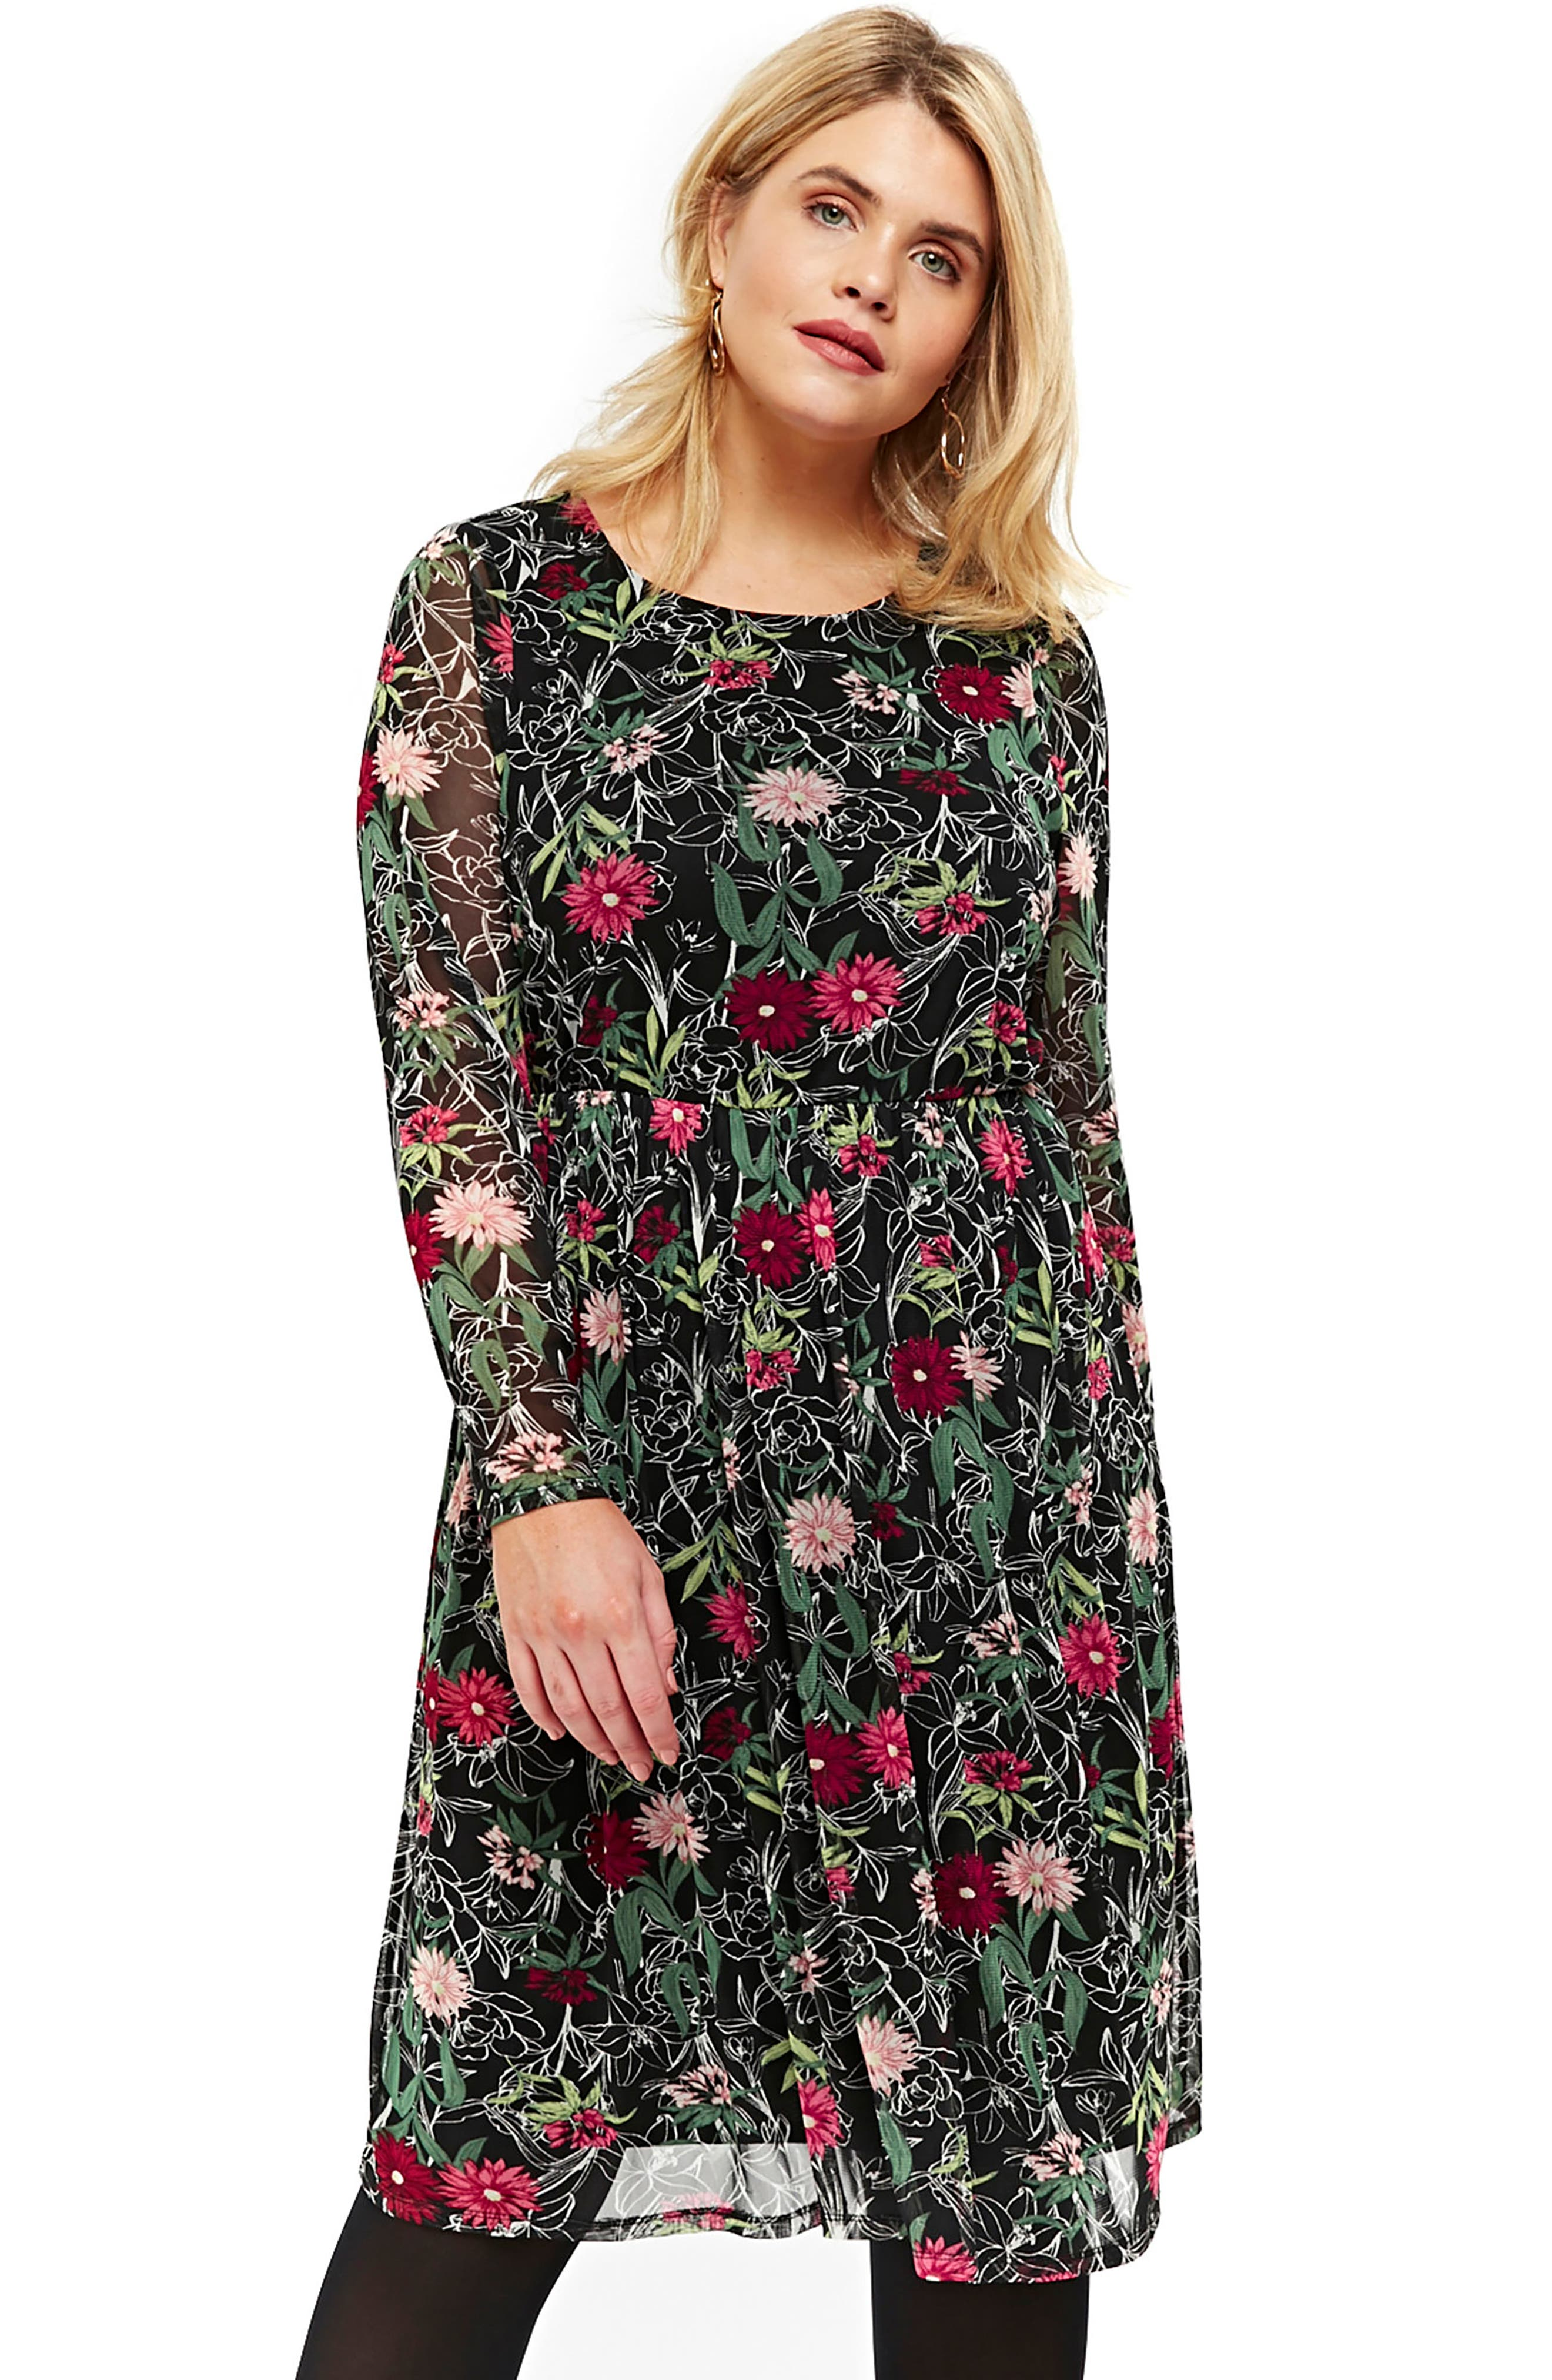 Floral Print Mesh Fit & Flare Dress,                             Alternate thumbnail 5, color,                             005